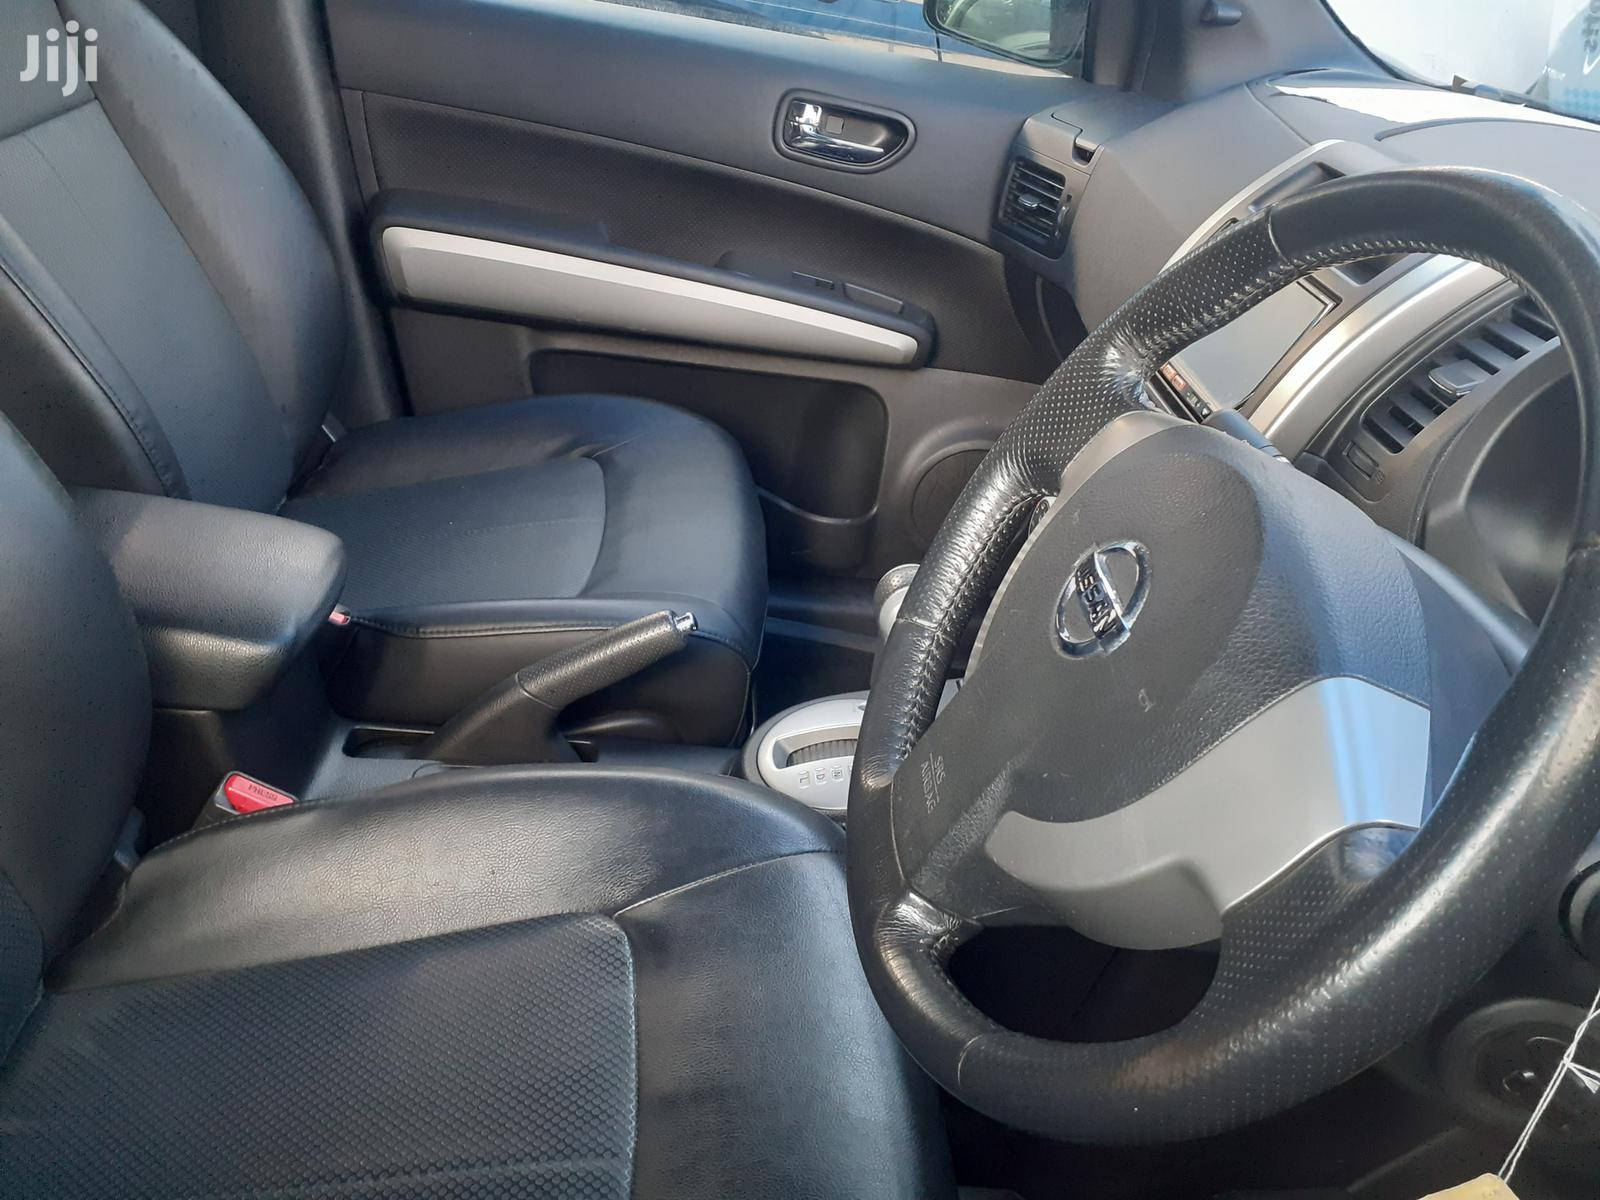 Nissan X-Trail 2012 Green | Cars for sale in Mvita, Mombasa, Kenya